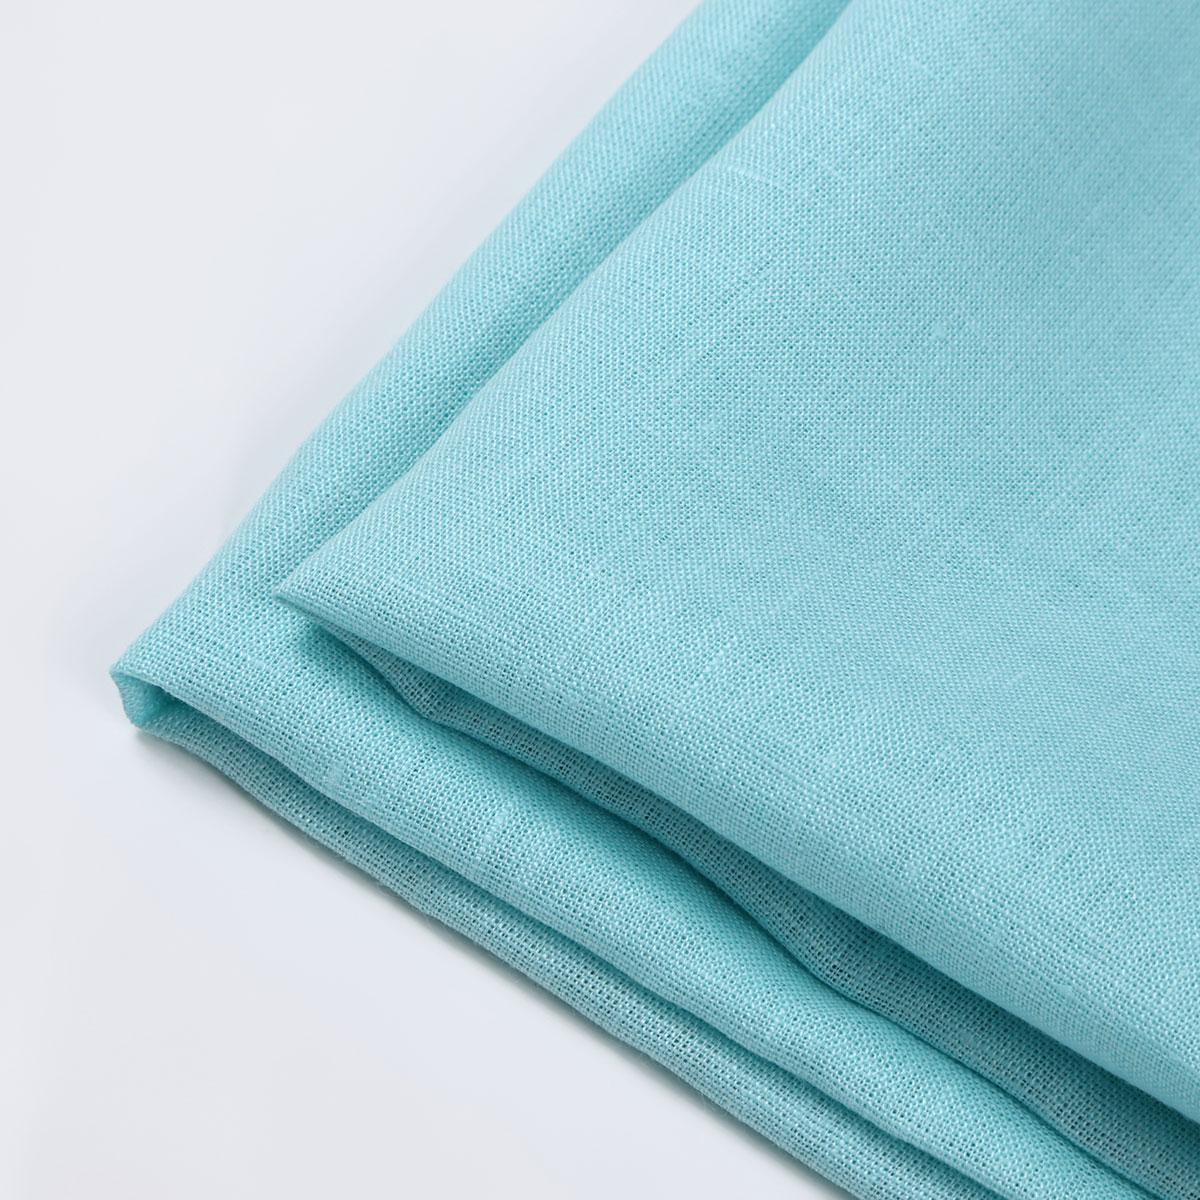 150cm巾 【リネン100%生地】 スカイブルー 無地 薄地 1m単位 BL-1105 【ワンピース、スカート、ブラウス、カーテンに最適】